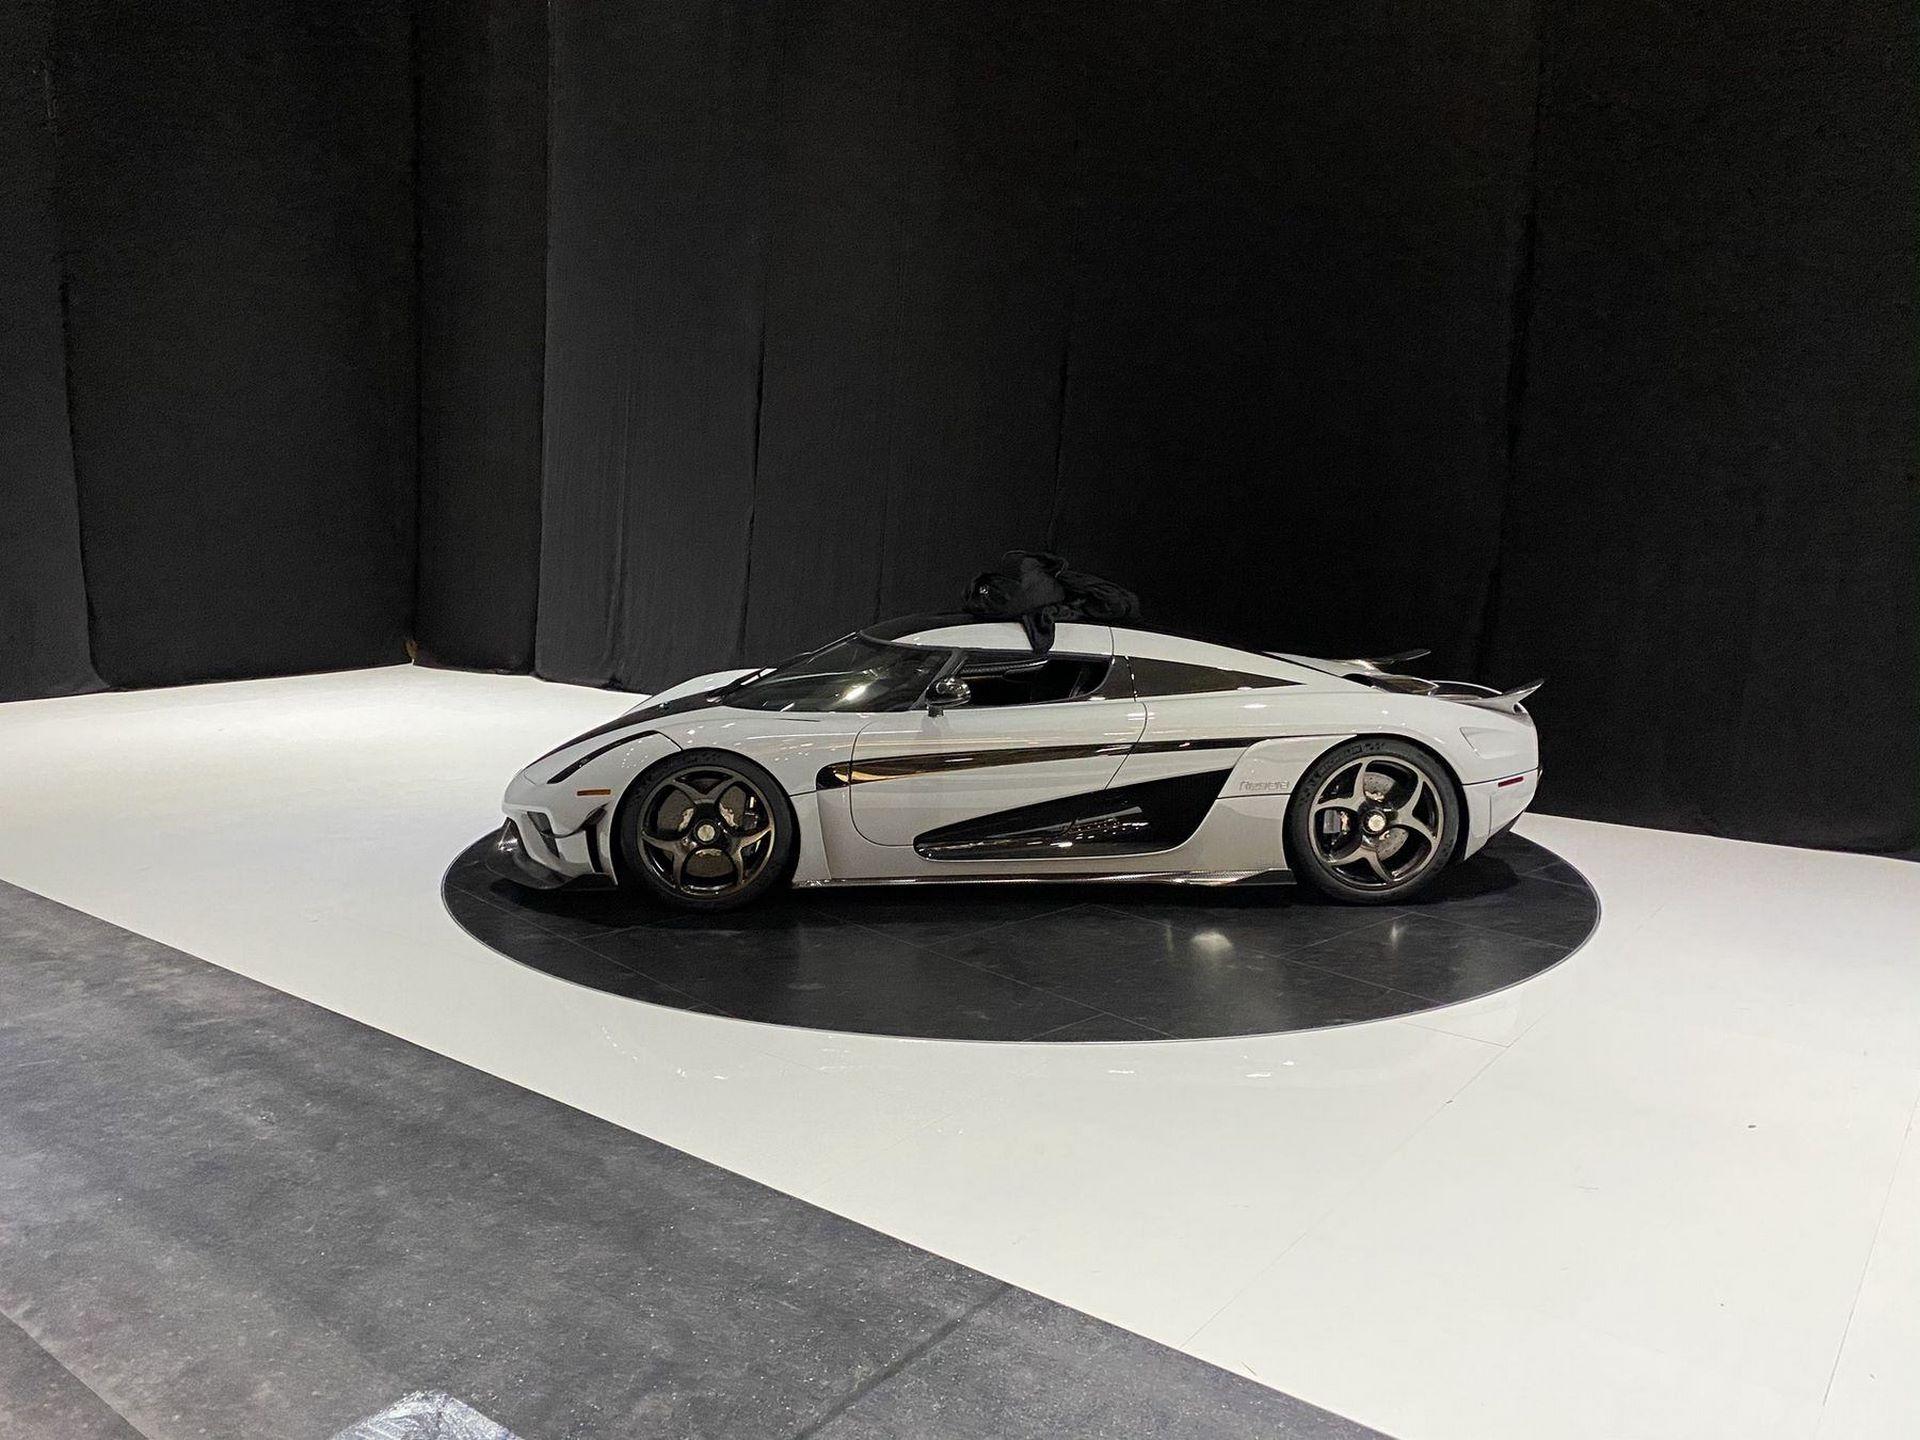 Geneva motor show 2020 (7)